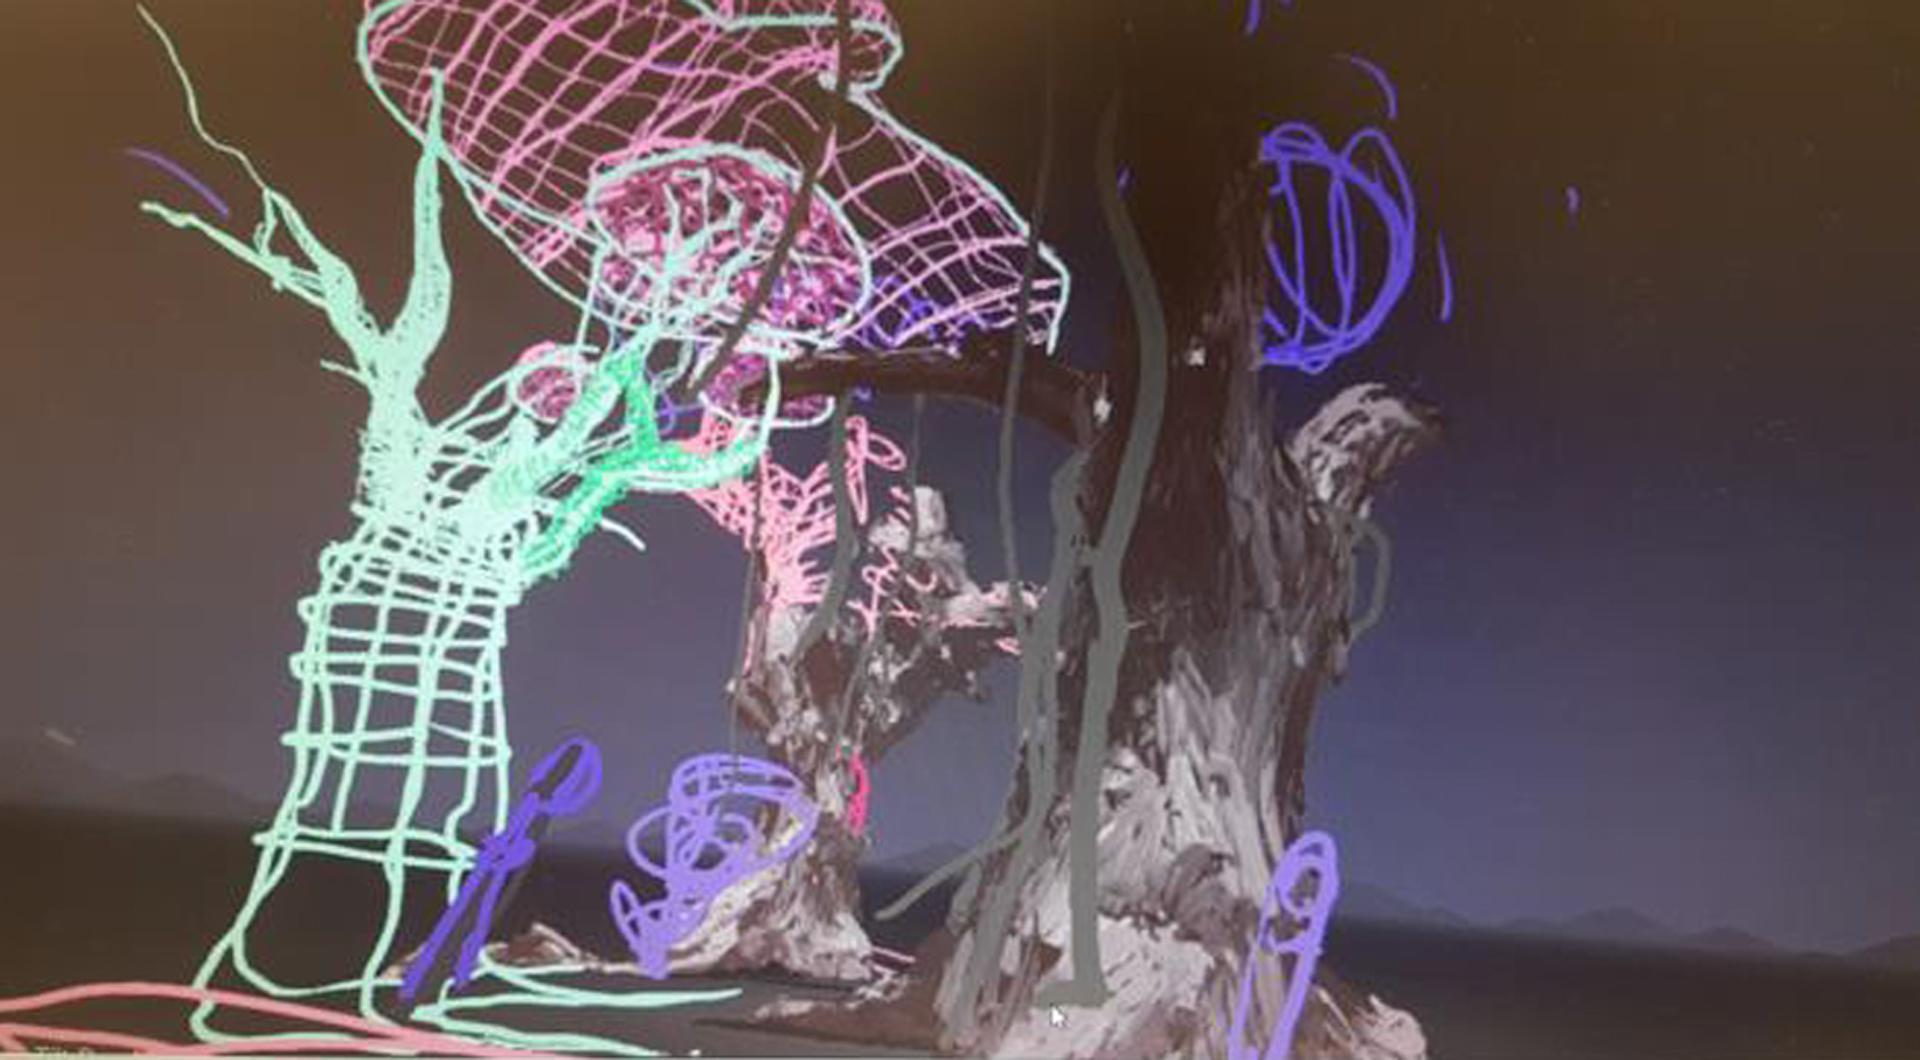 ©ISEA2019: 25th International Symposium on Electronic Art, Doros Polydorou, The Lemur's Forest